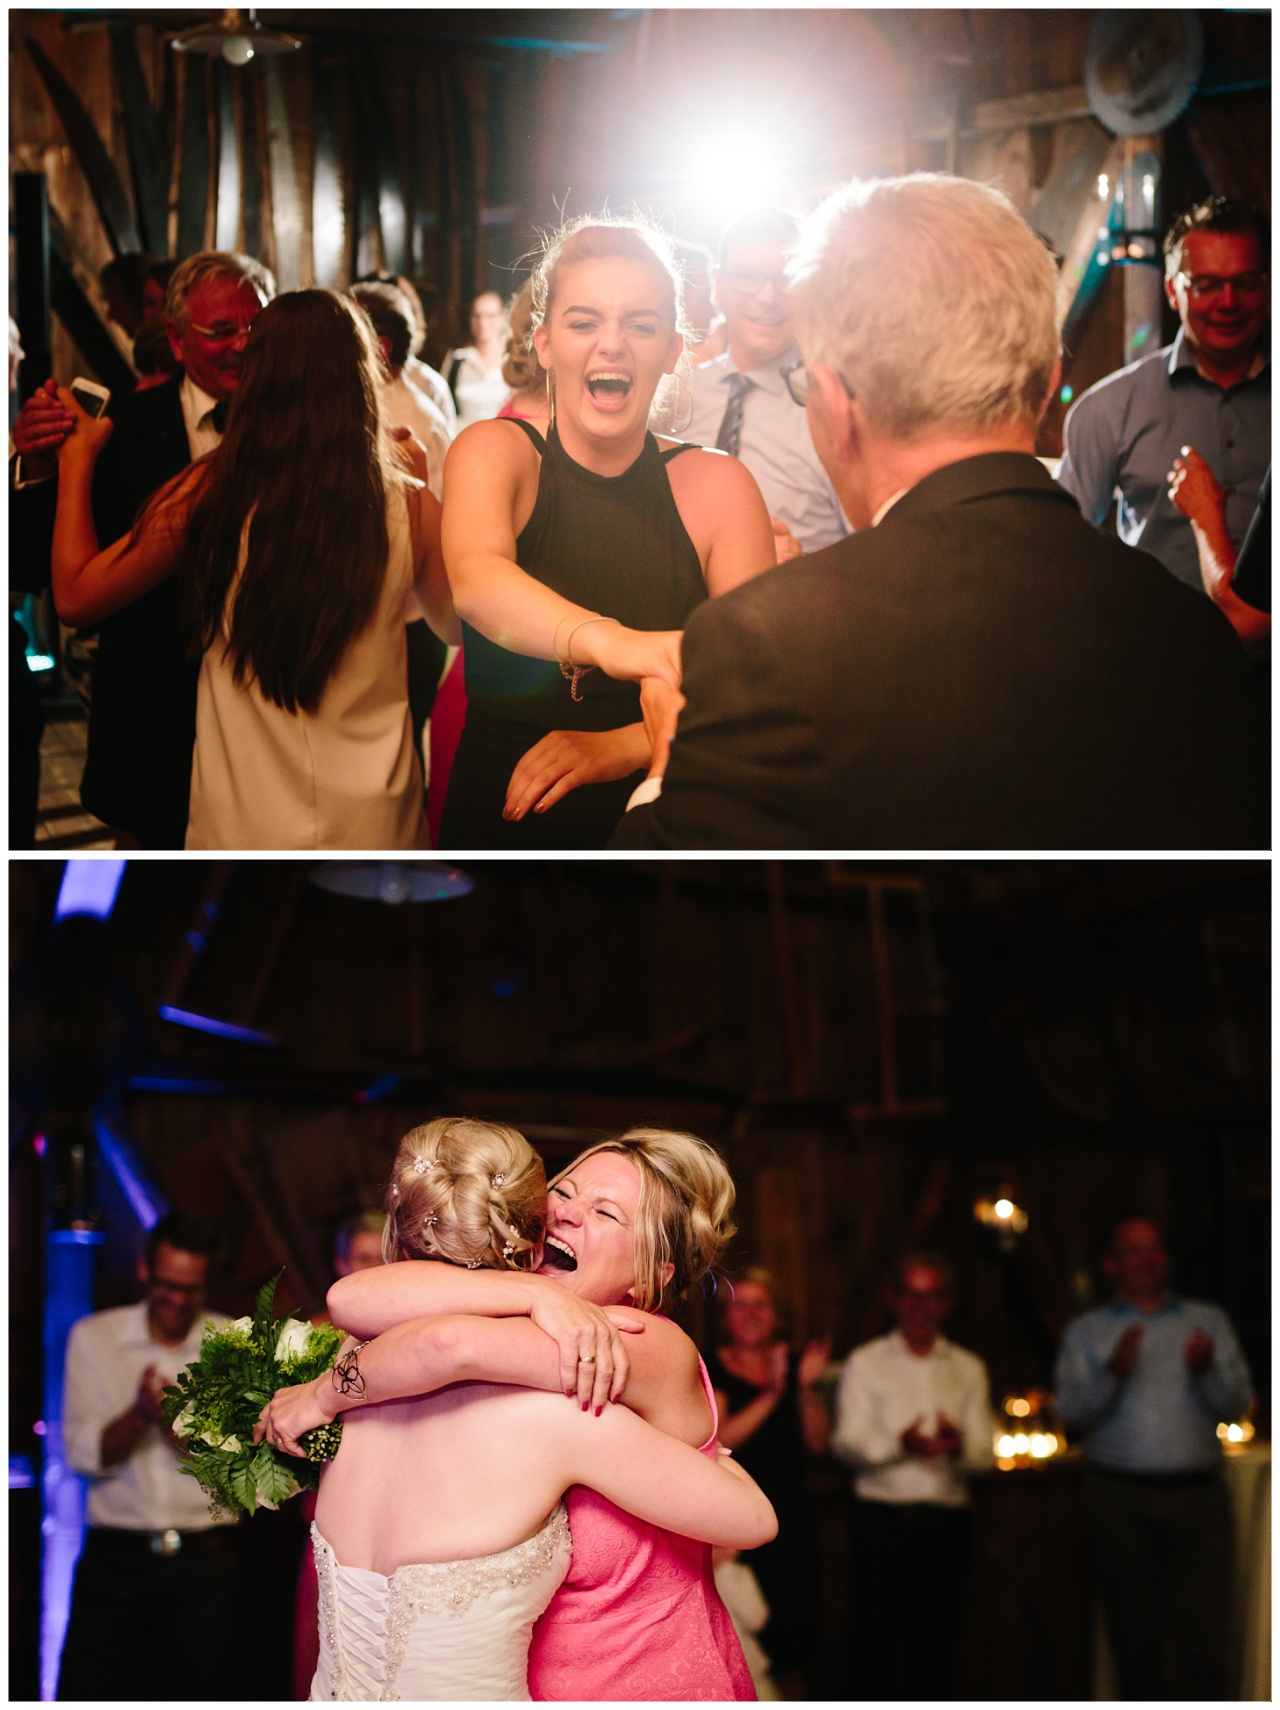 Hochzeitsfotograf Seefeld Triendlsaege 17